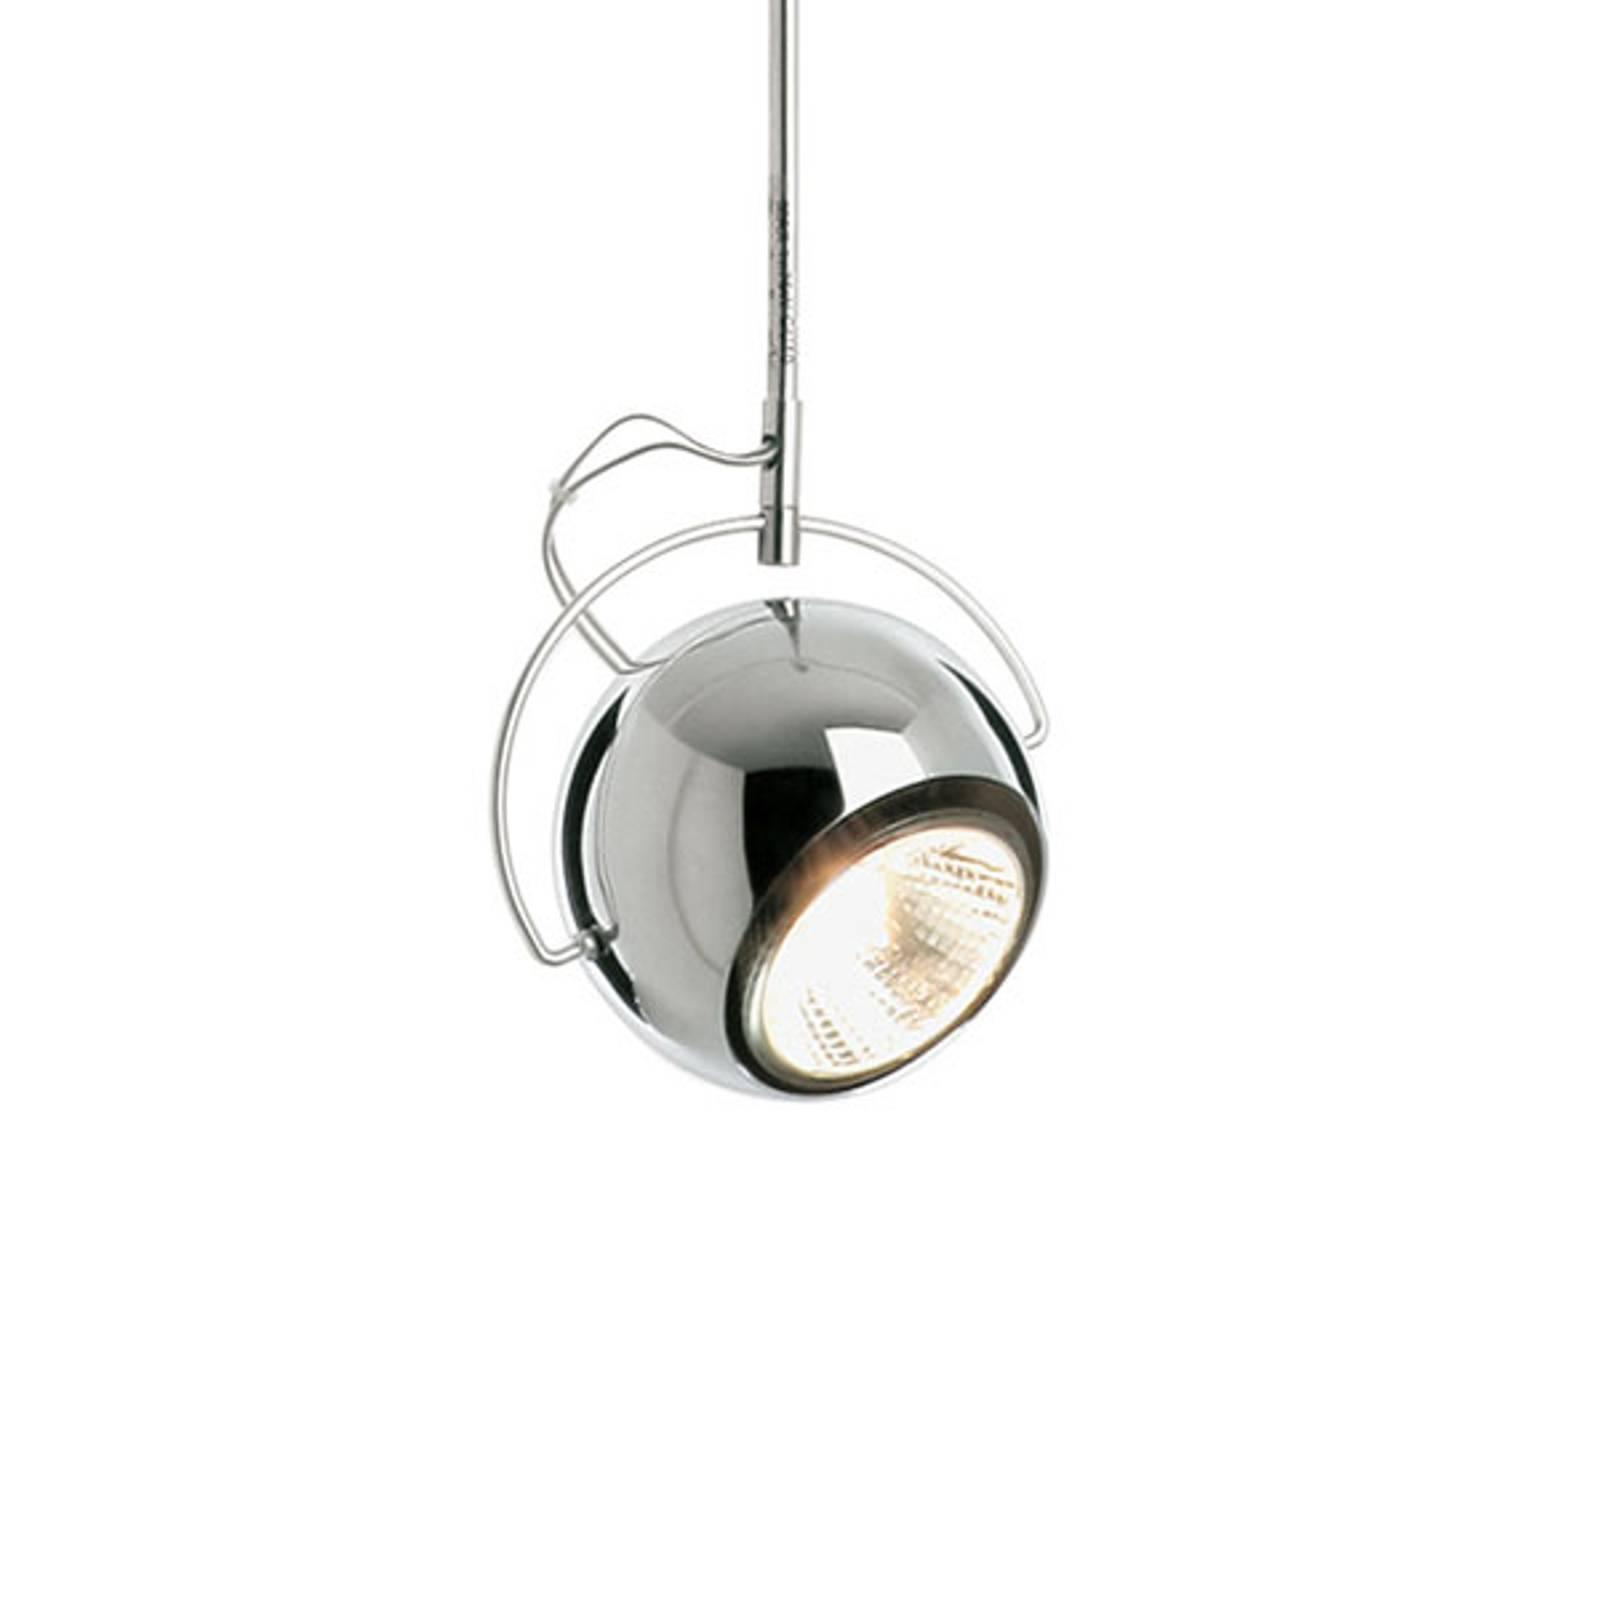 Fabbian Beluga staal chroom-hanglamp, Ø 9 cm